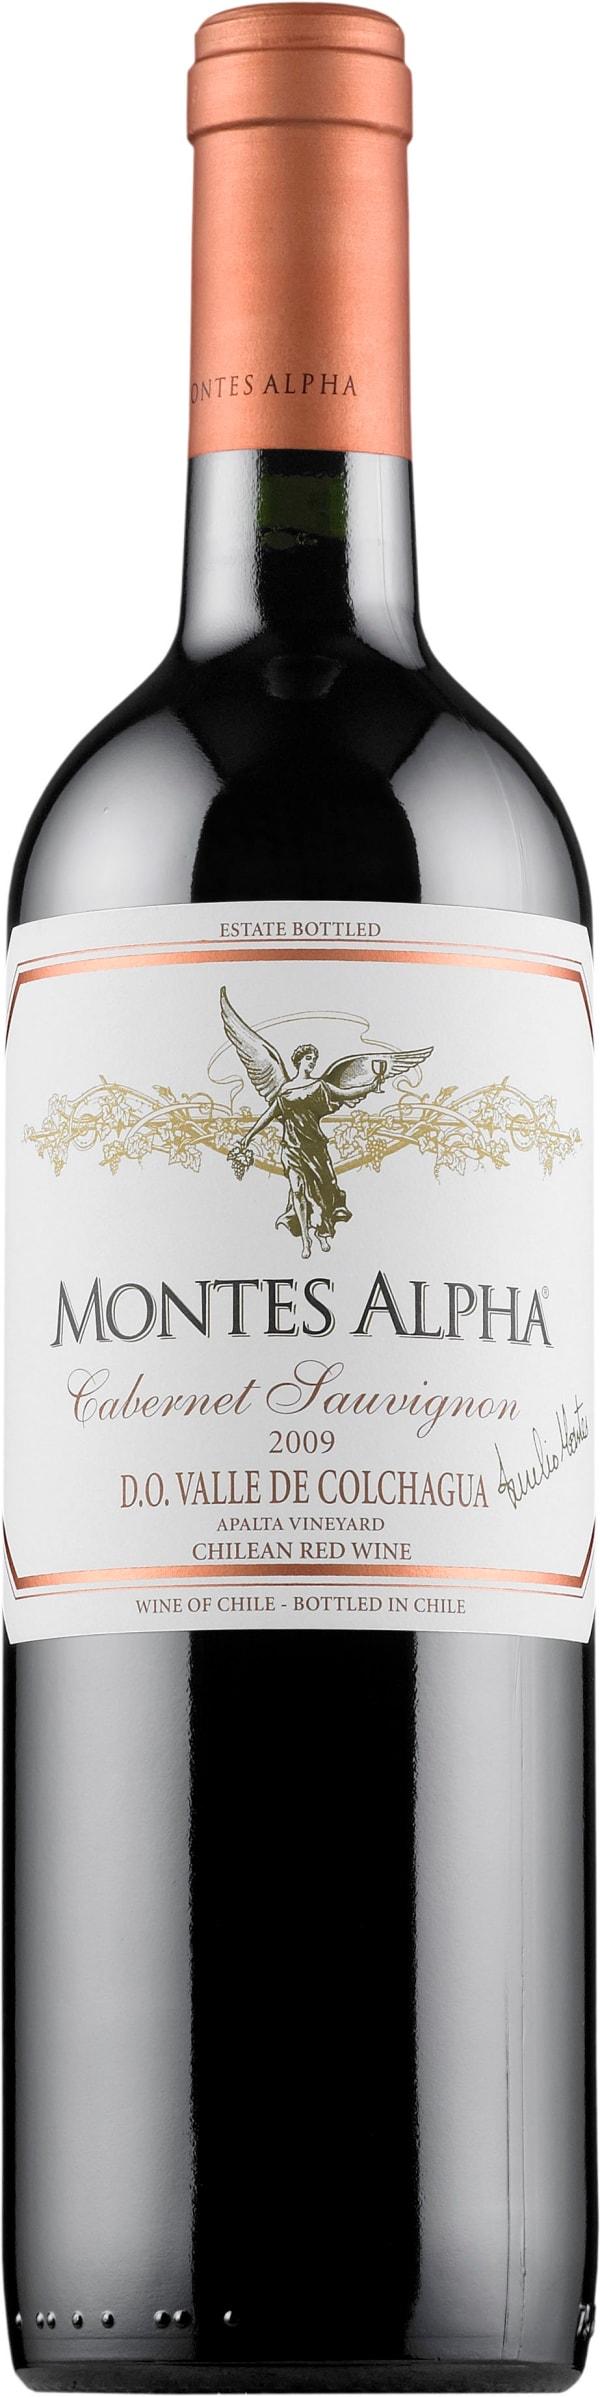 Montes Alpha Cabernet Sauvignon 2017 gift packaging